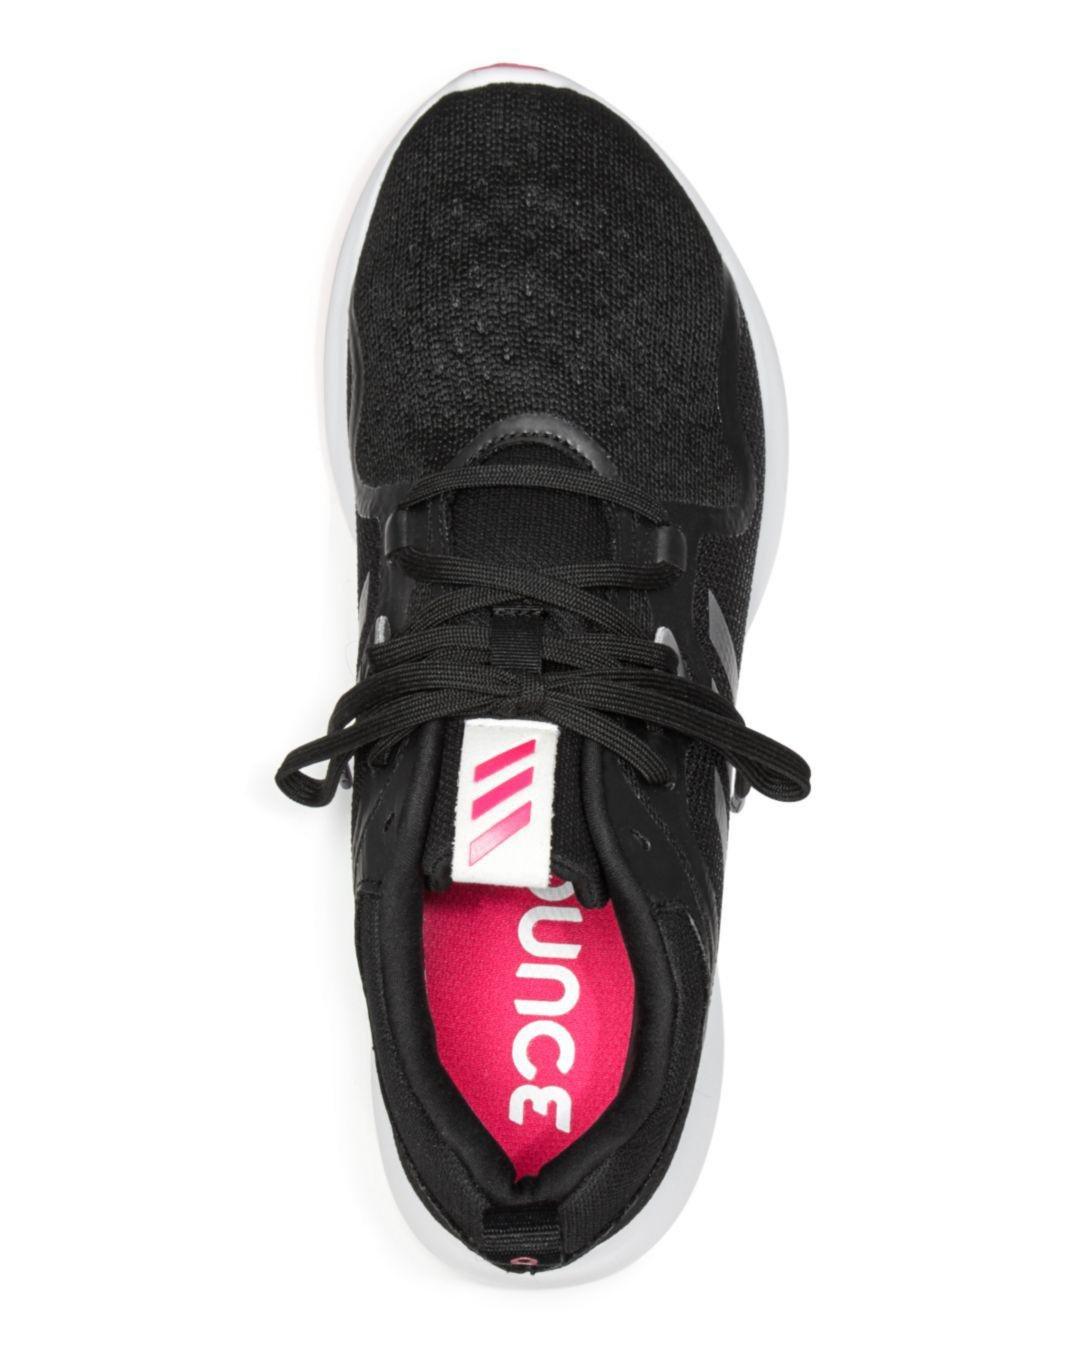 sale retailer e5a49 aa77e Adidas - Black Womens Edgebounce Mesh Lace Up Sneakers - Lyst. View  fullscreen